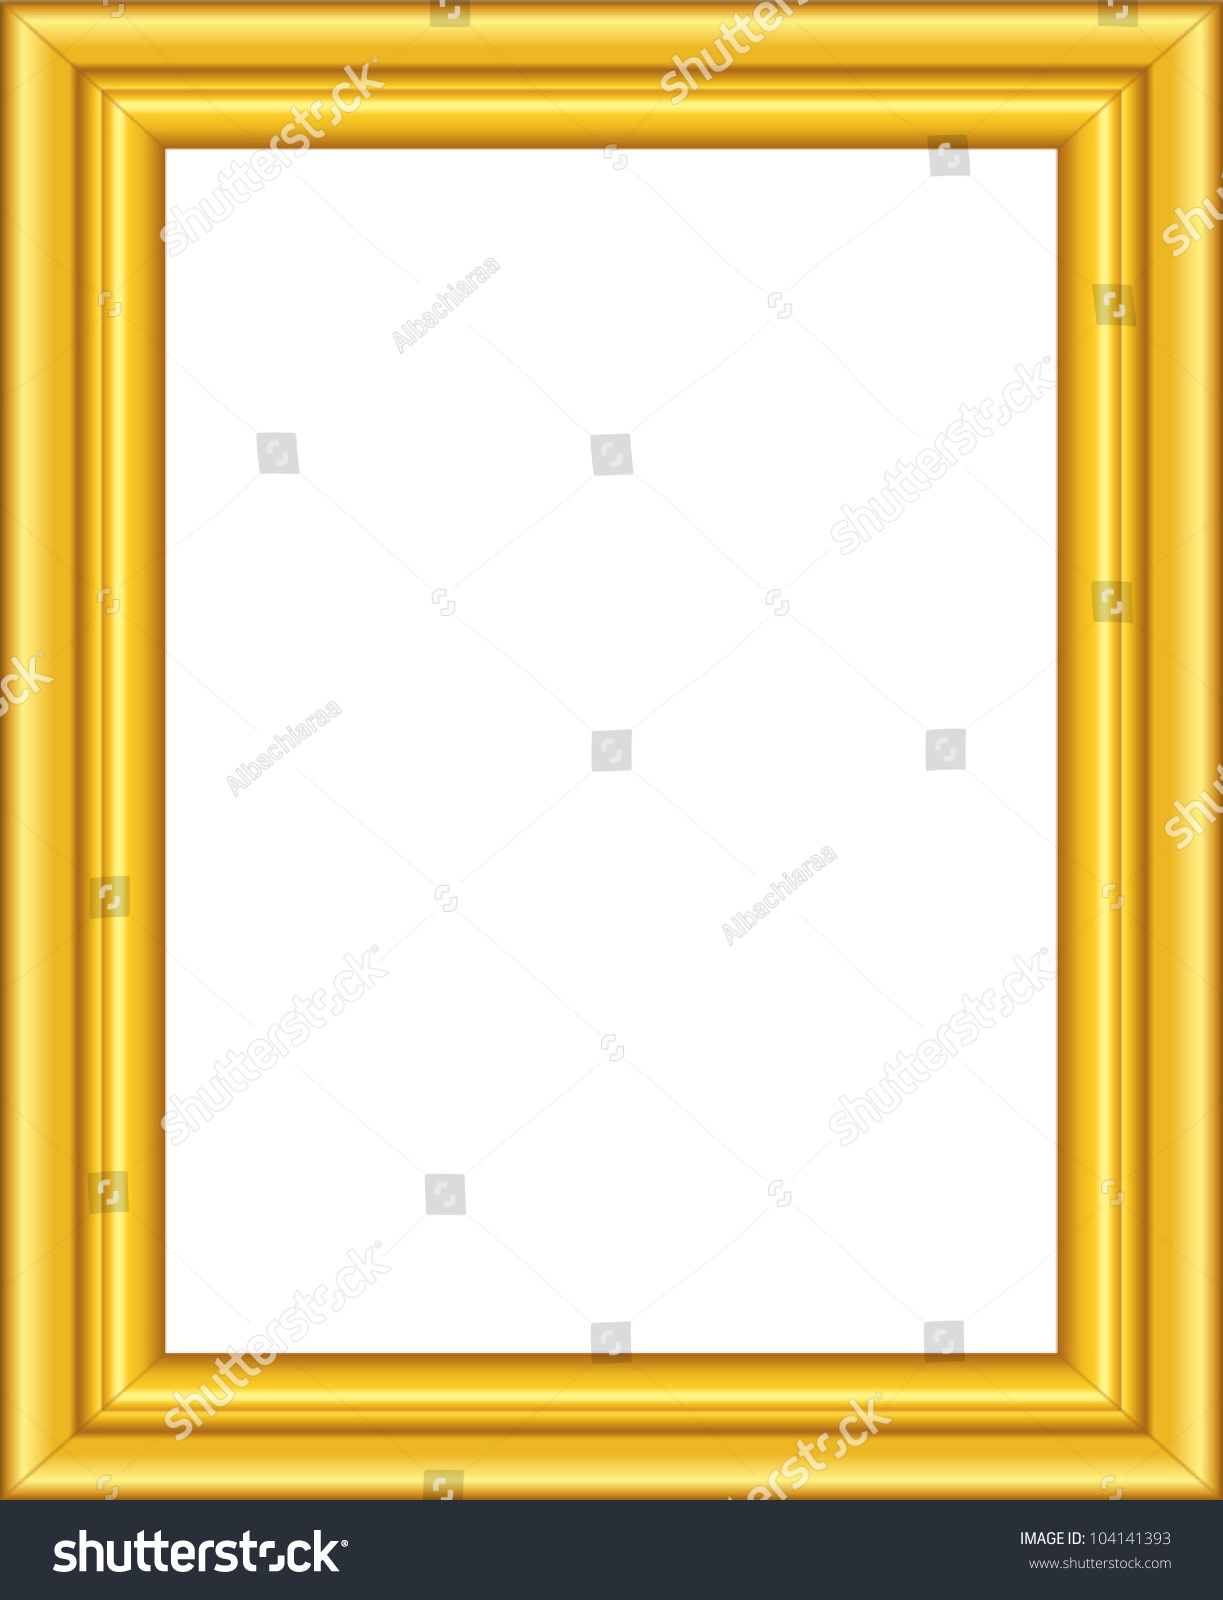 Beautiful golden framework. Vector picture frame.